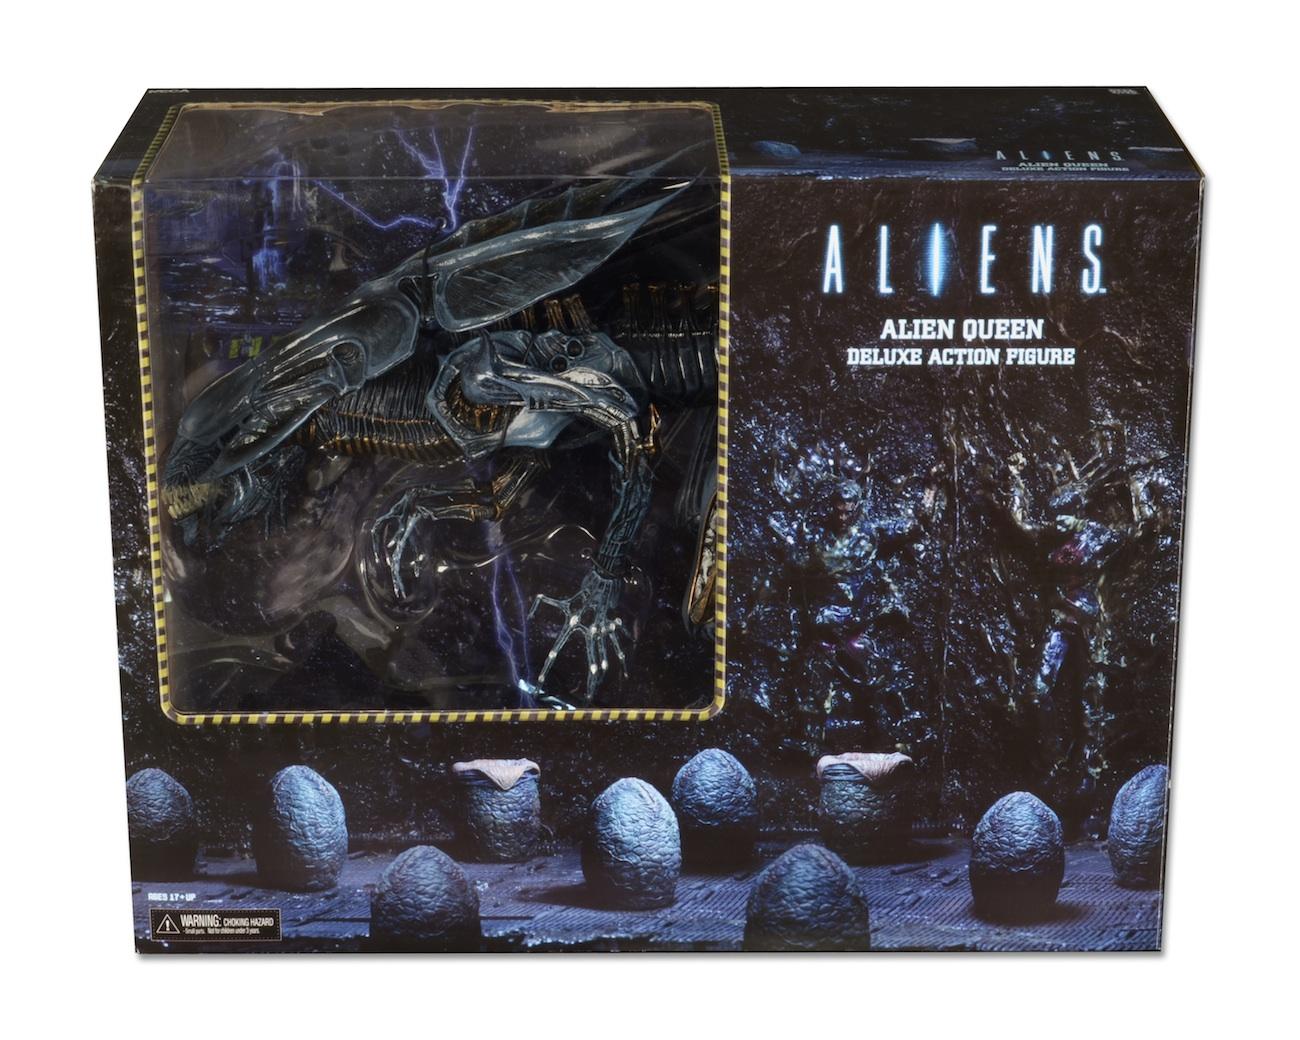 NECA Toys Reissuing Robocop ED-209, Alien Queen & Freddy Glove Collectibles